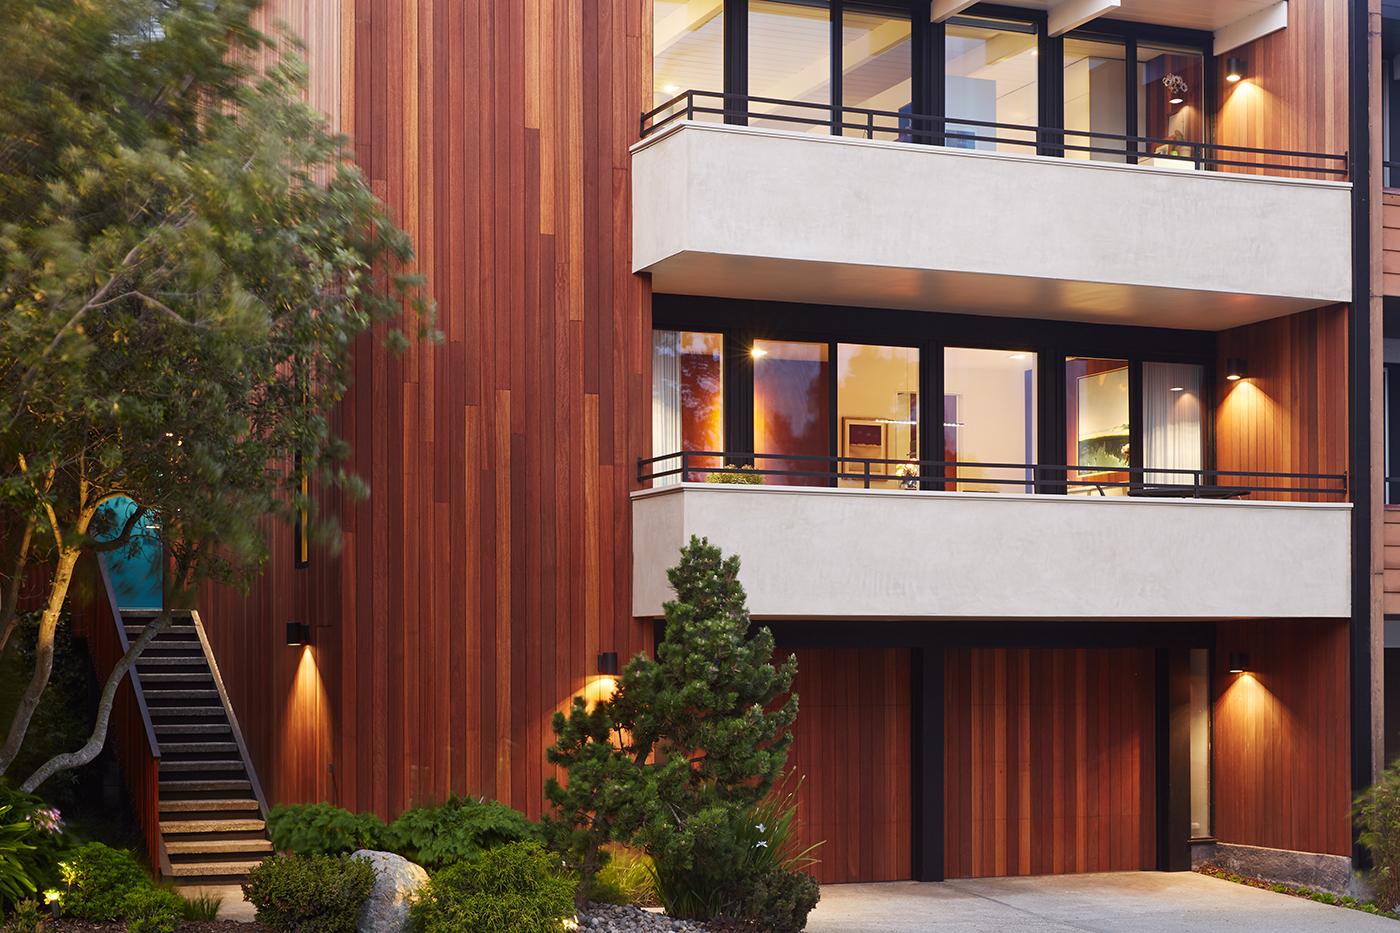 San Francisco Eichler Remodel Residential Architect Klopf